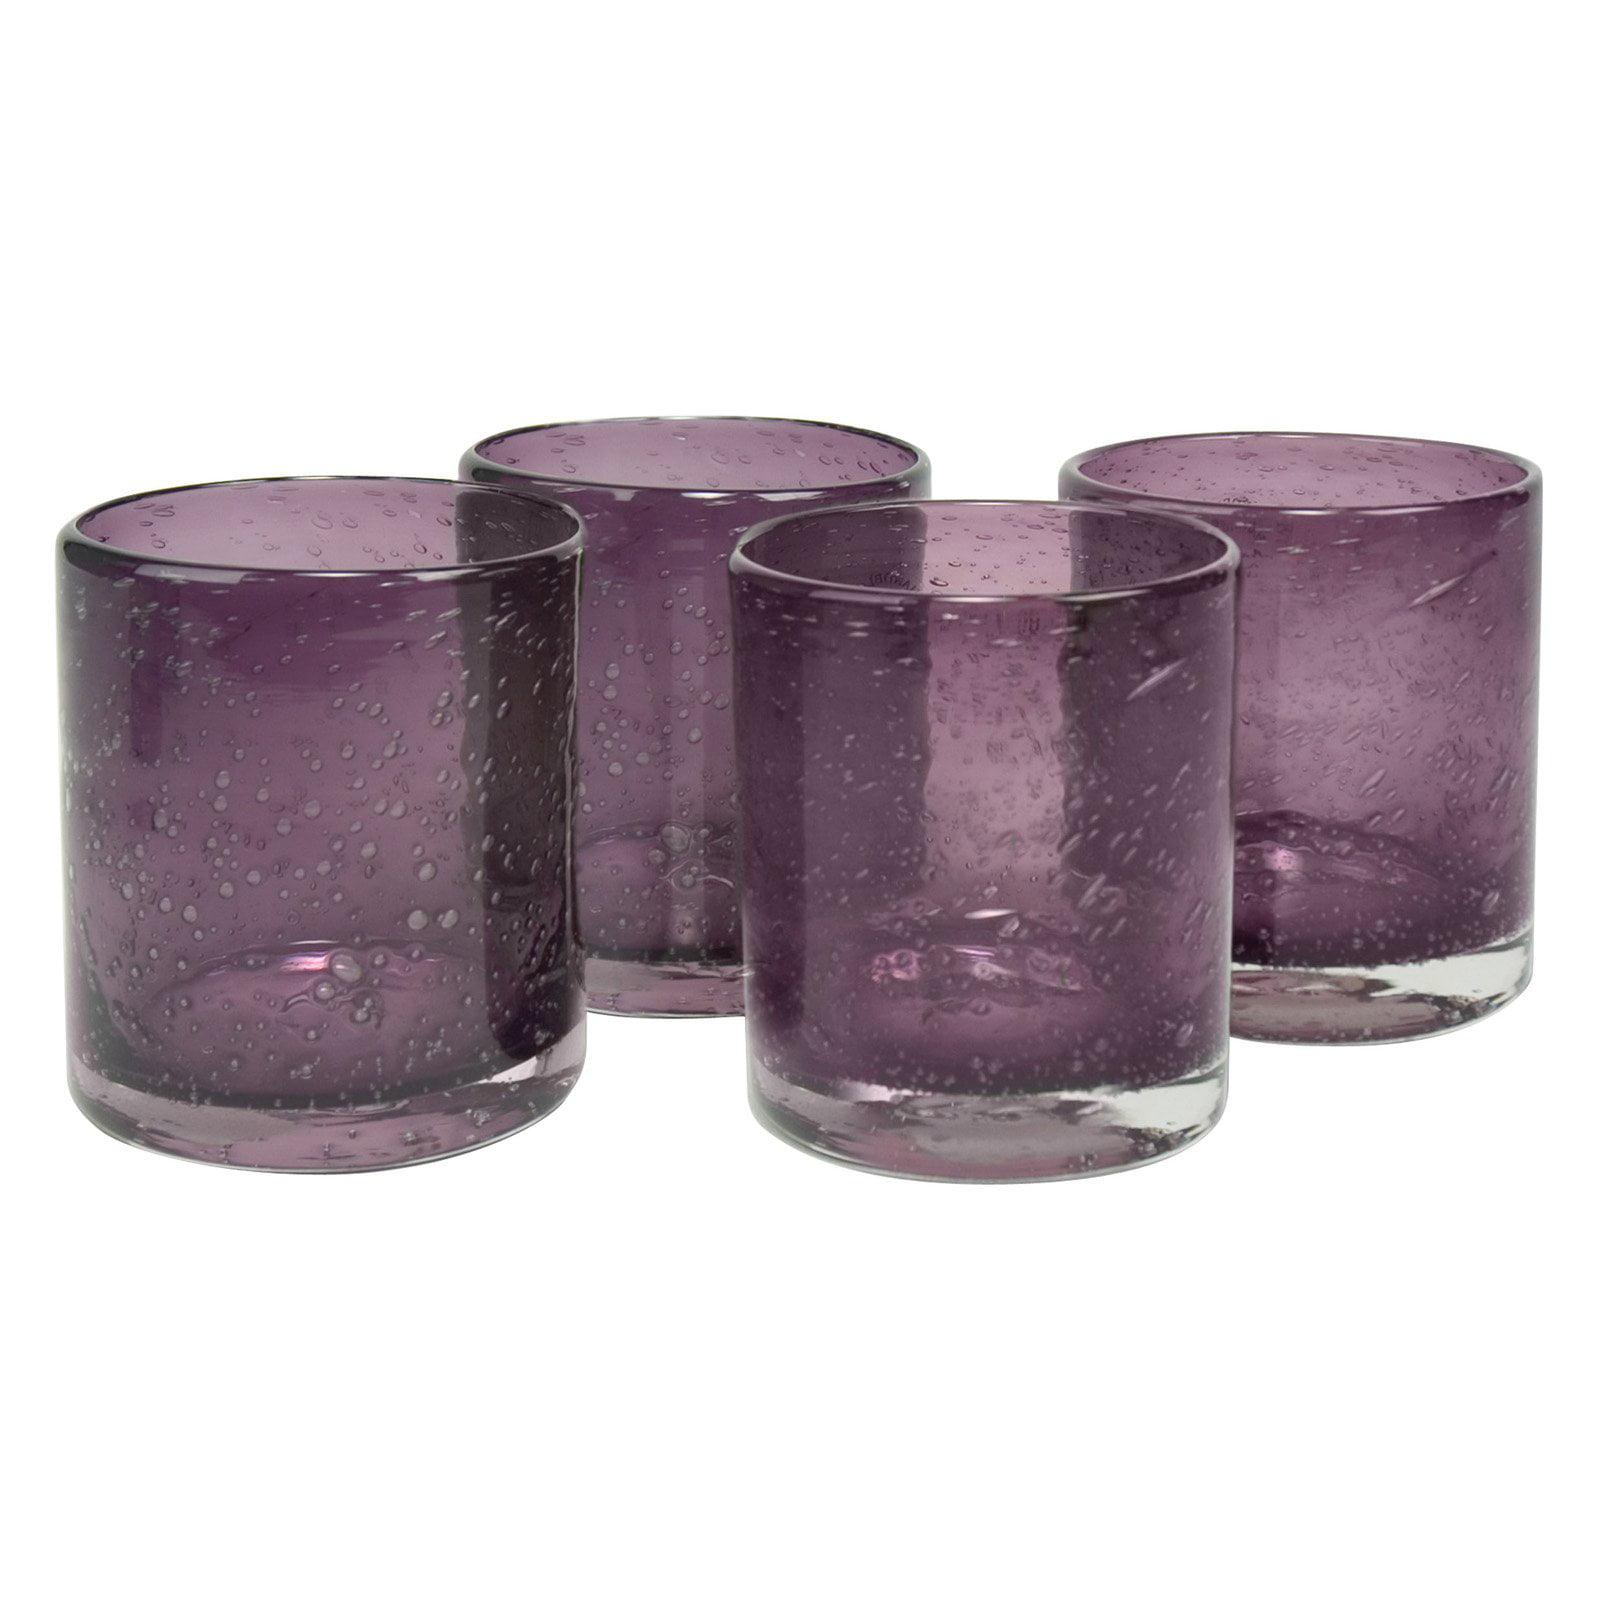 Artland Inc. Iris Plum DOF Glasses - Set of 4